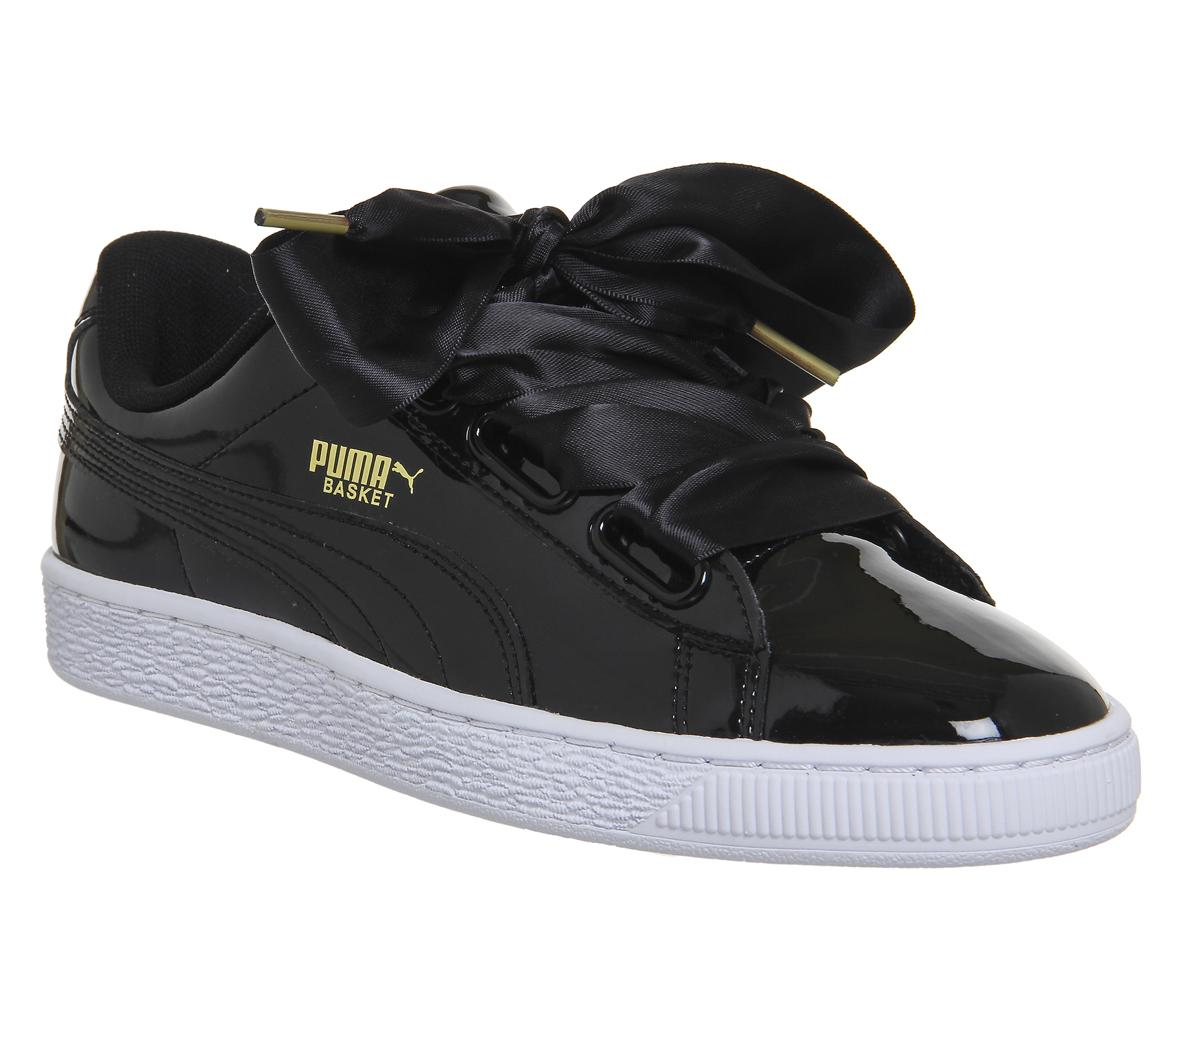 Puma Basket Heart Trainers Black Patent